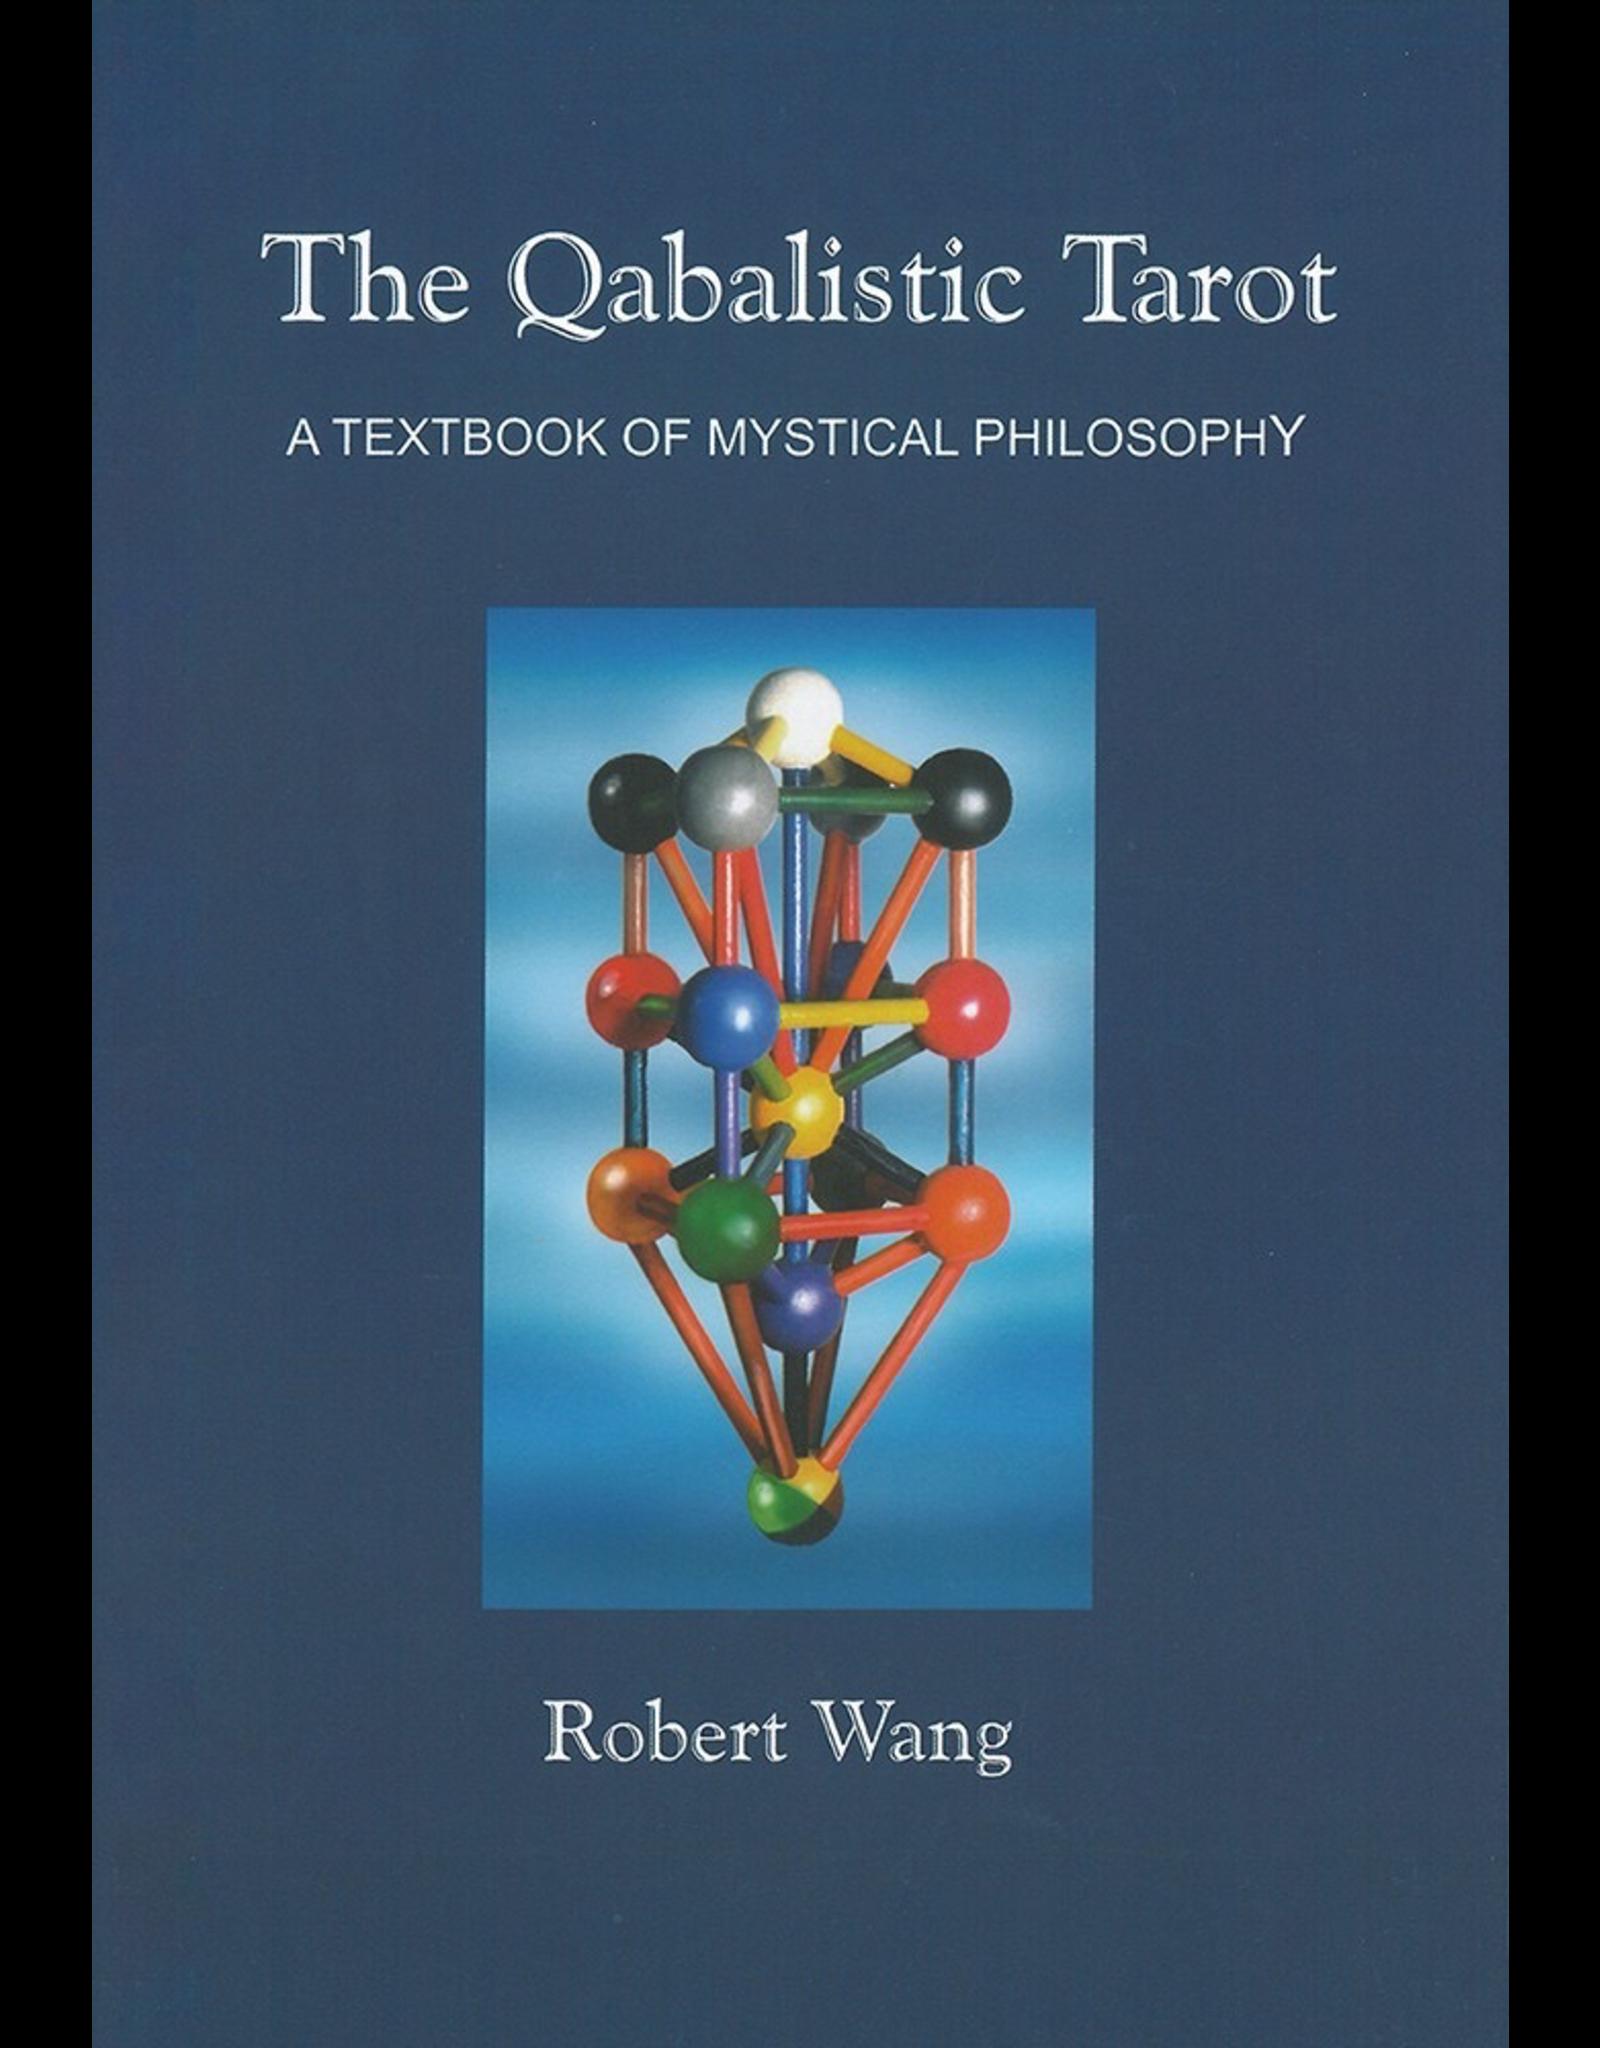 The Qabalistic Tarot Book